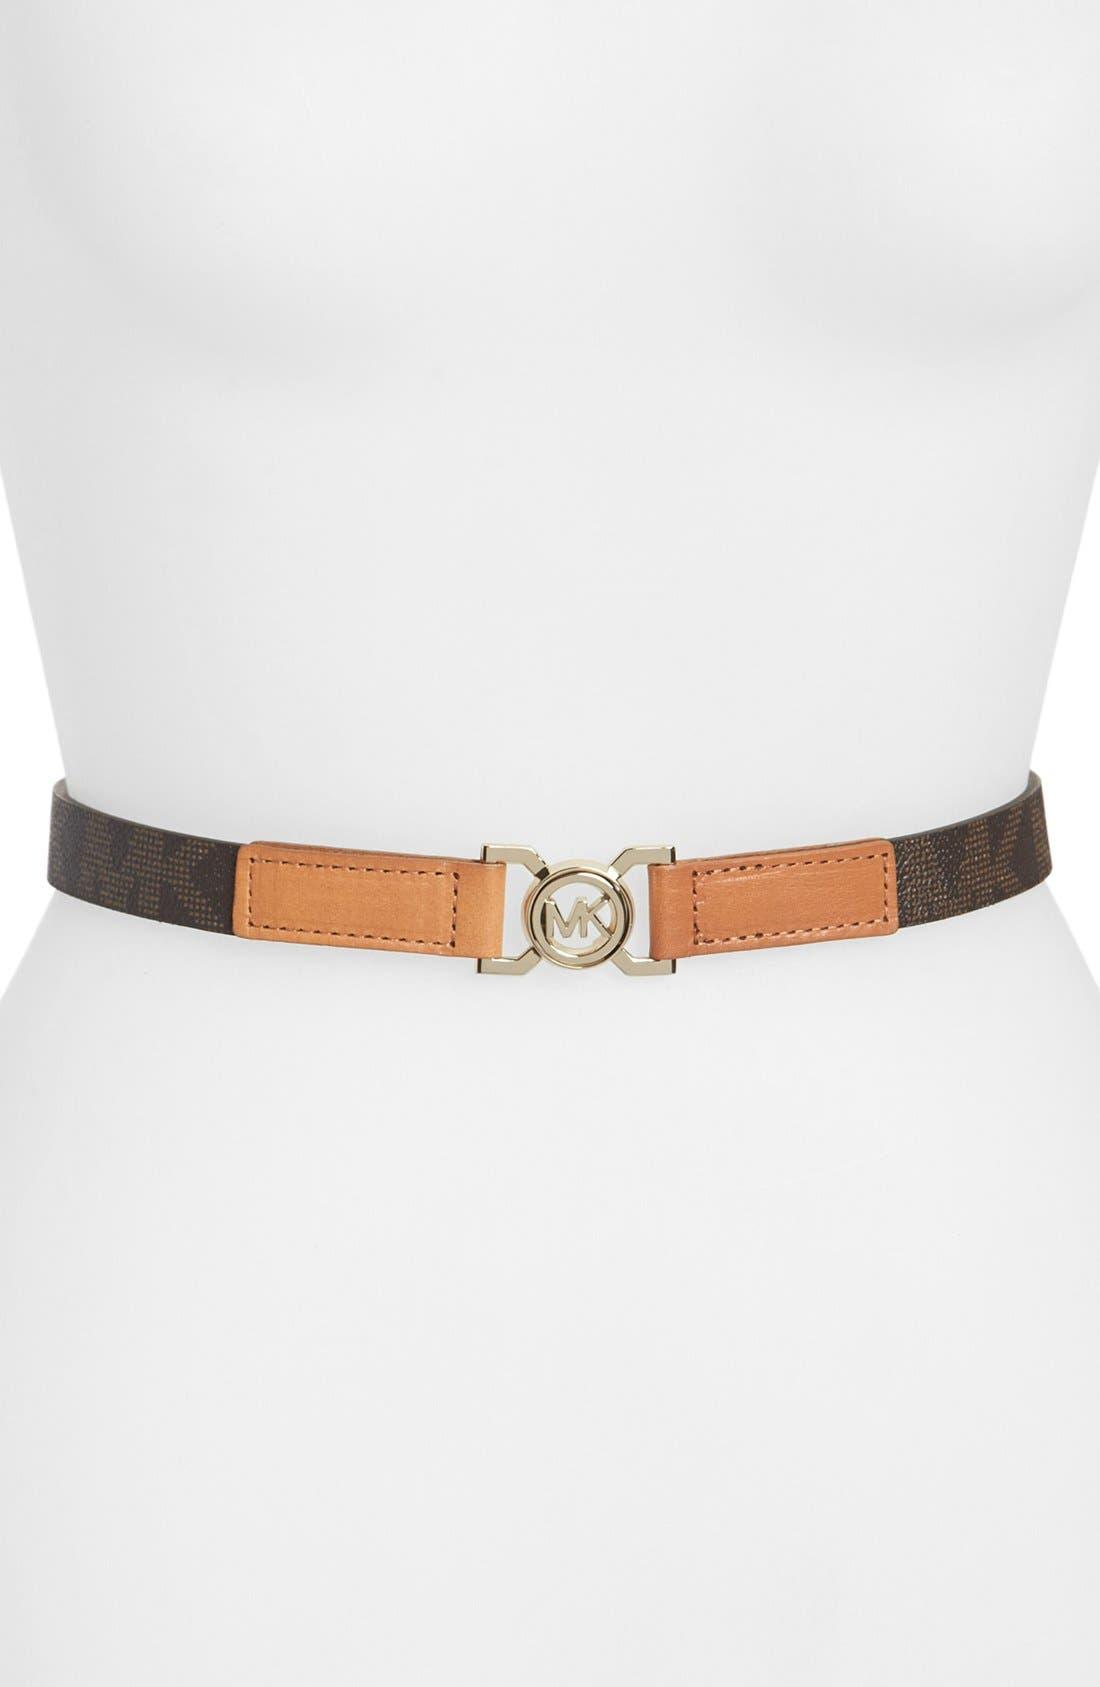 Alternate Image 1 Selected - MICHAEL Michael Kors Interlocking Logo Belt